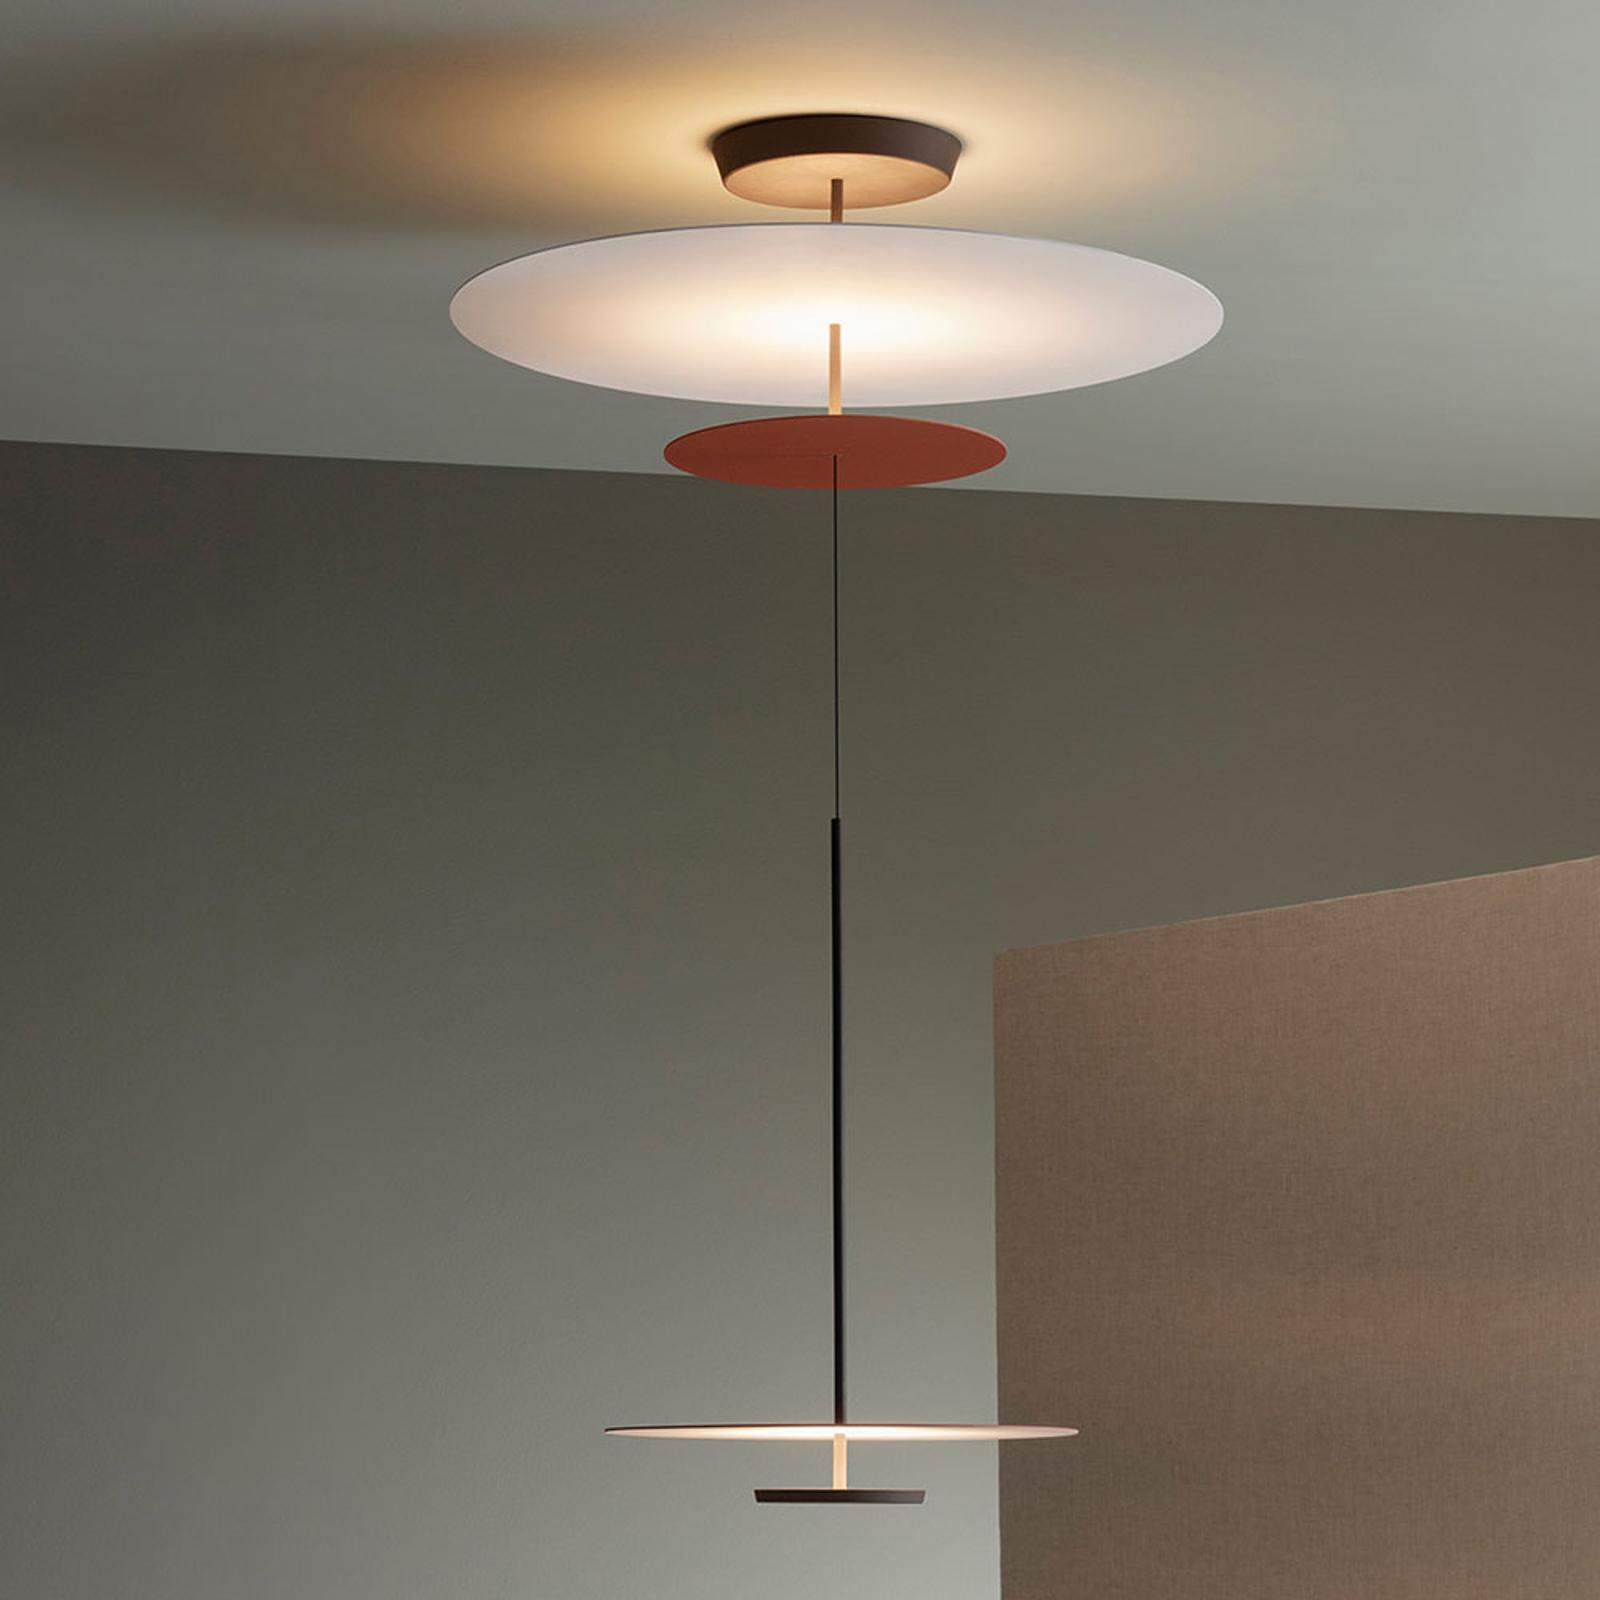 Vibia Flat LED-Hängelampe 3-flg. Ø 90cm terracotta